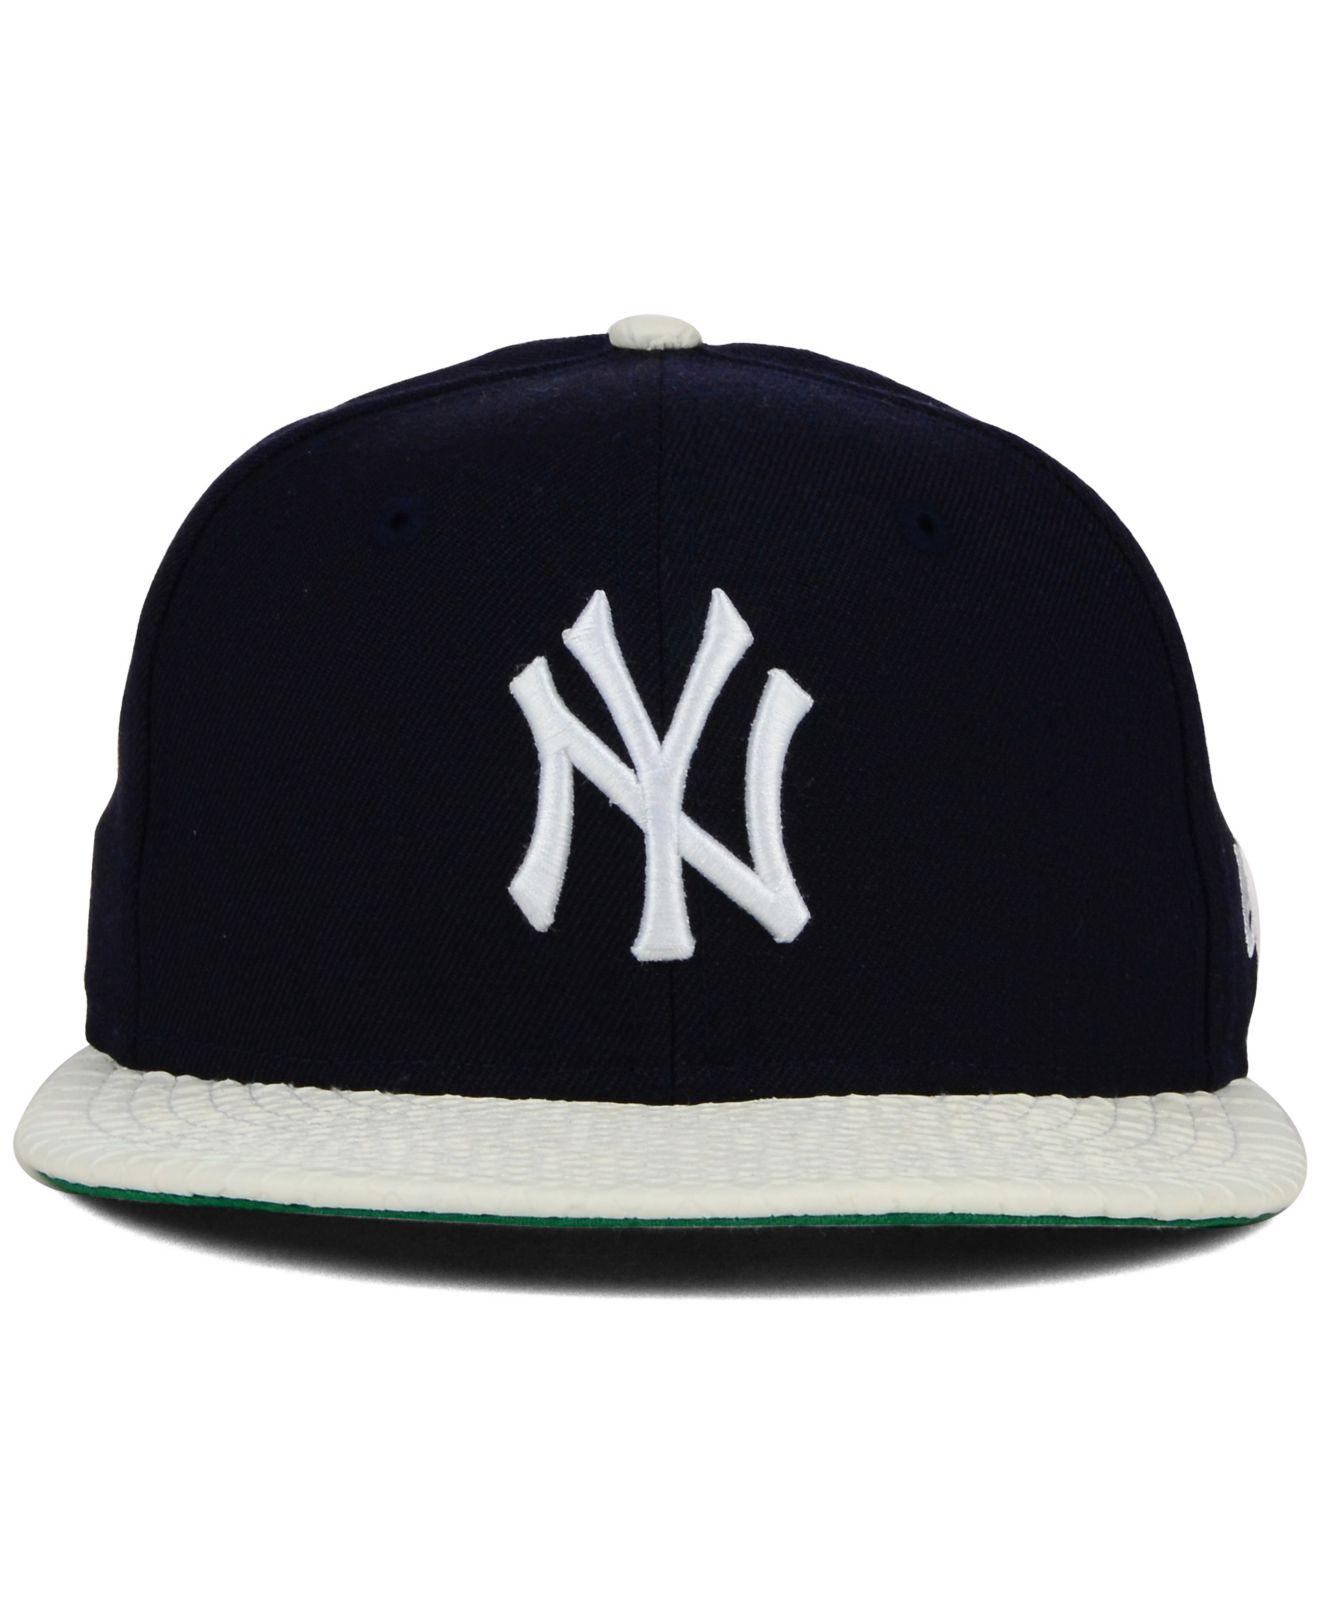 ebf51f7536a119 ... top quality lyst ktz new york yankees mlb team python 59fifty cap in  blue for men ...